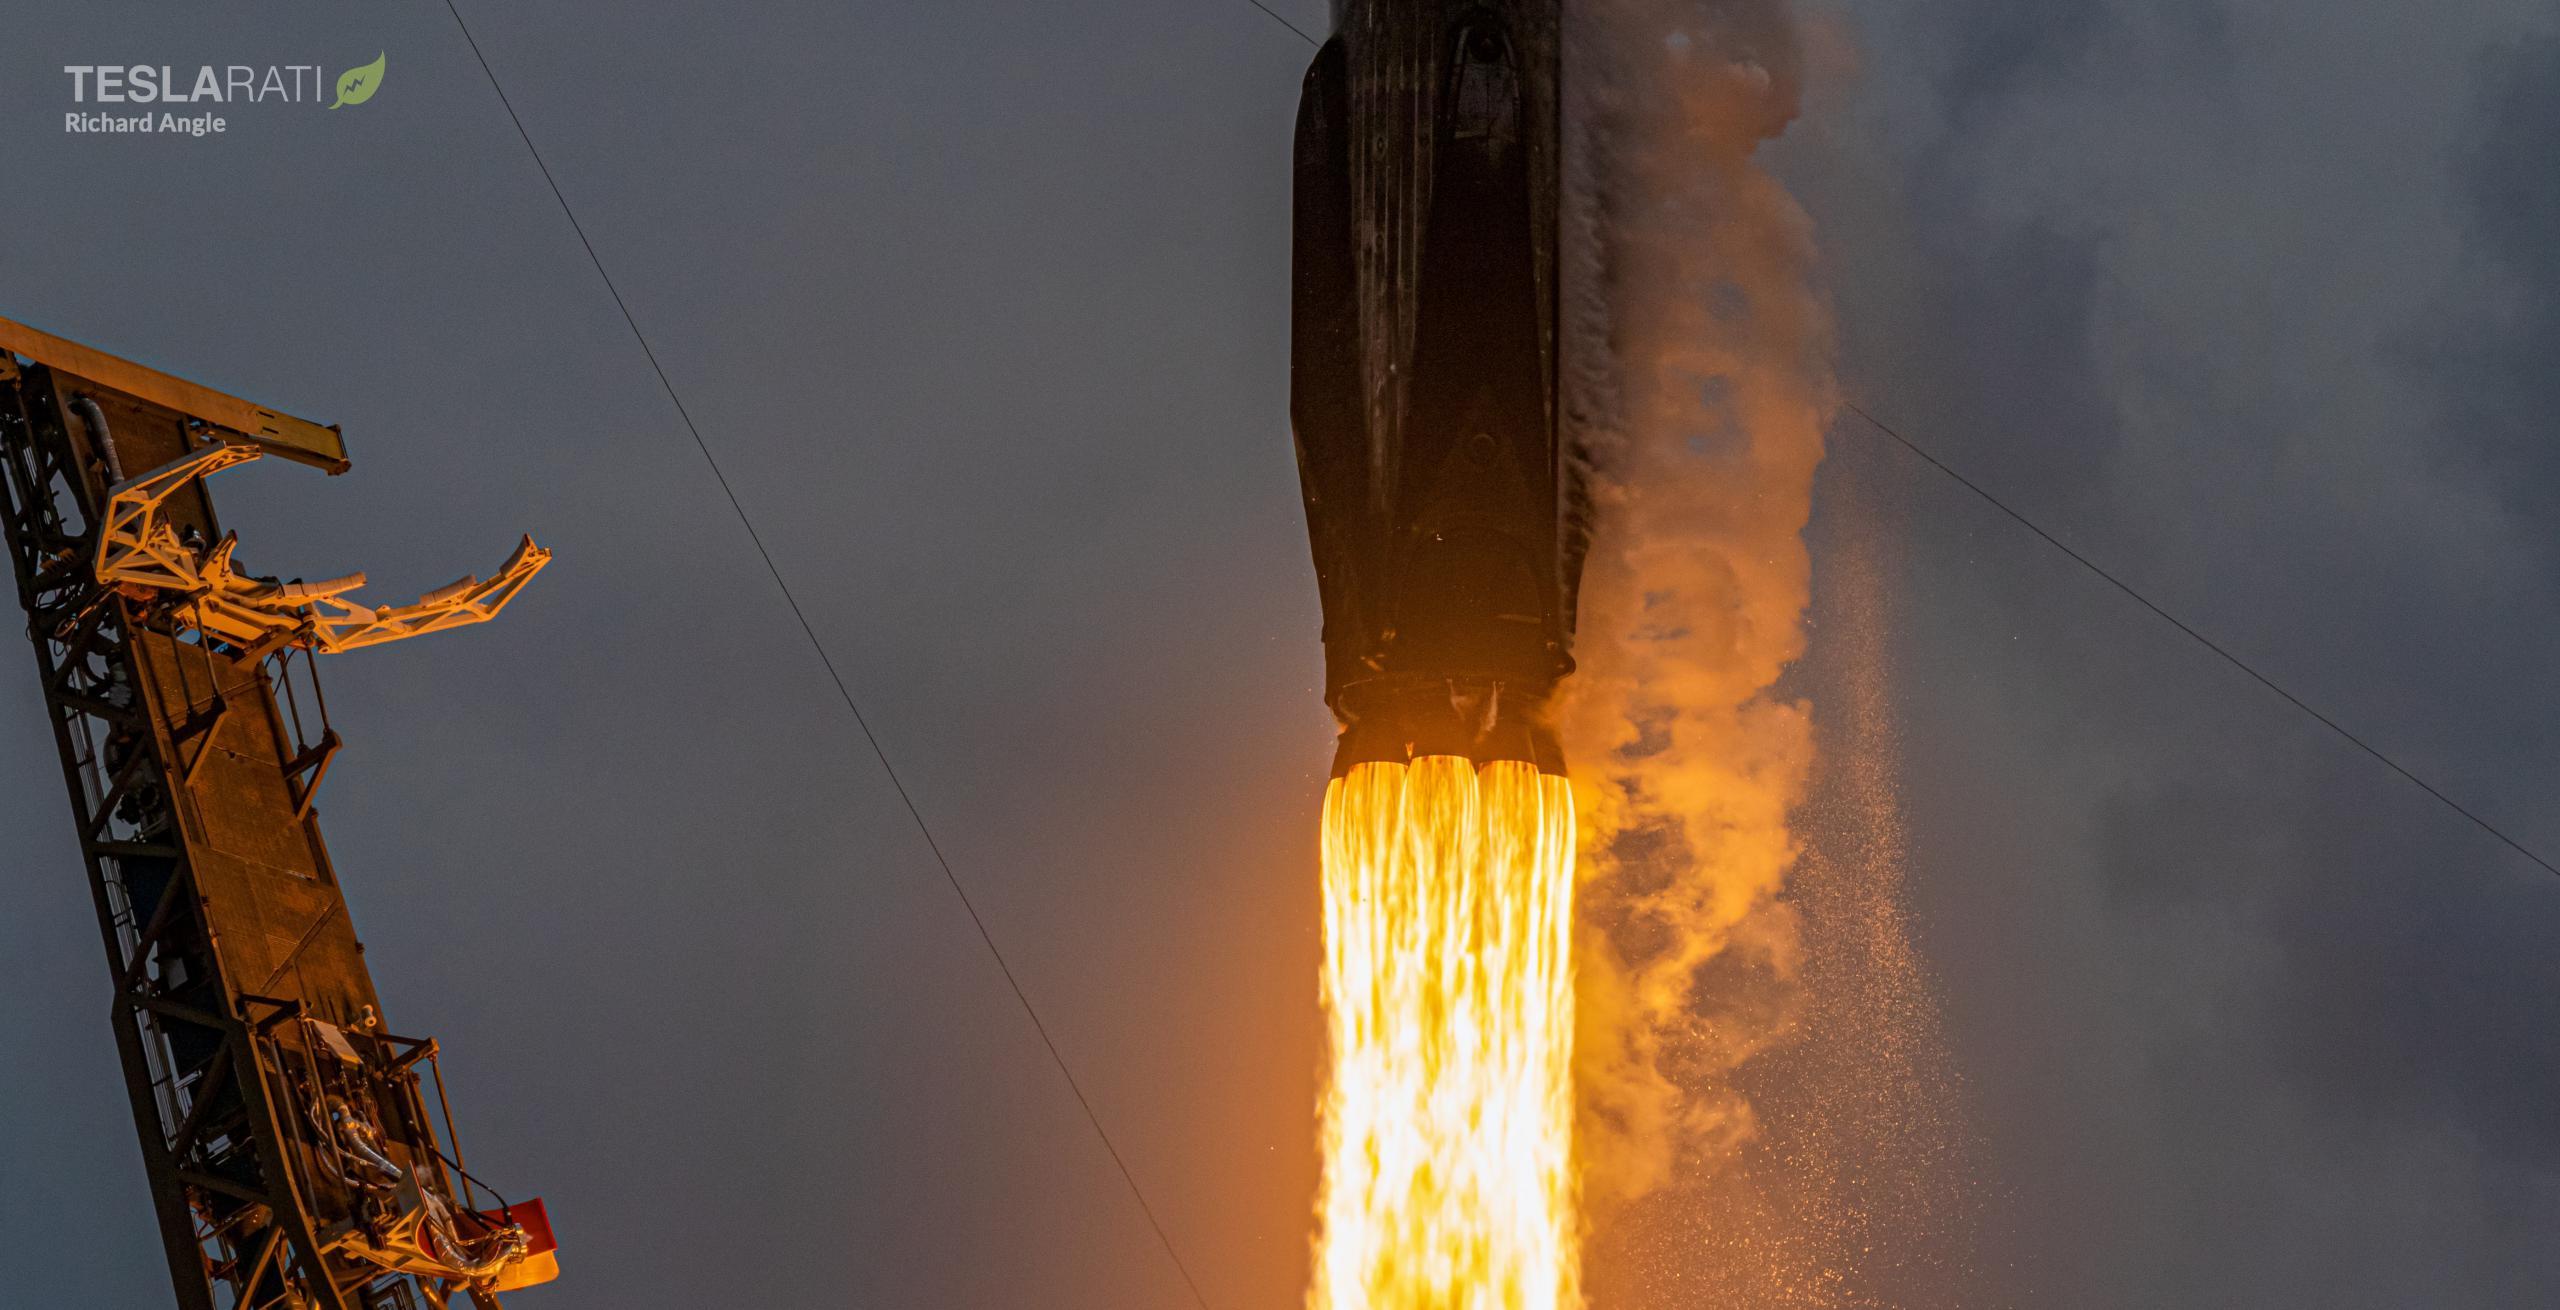 Transporter-2 Falcon 9 B1060 063021 (Richard Angle) launch 4 crop 2 (c)